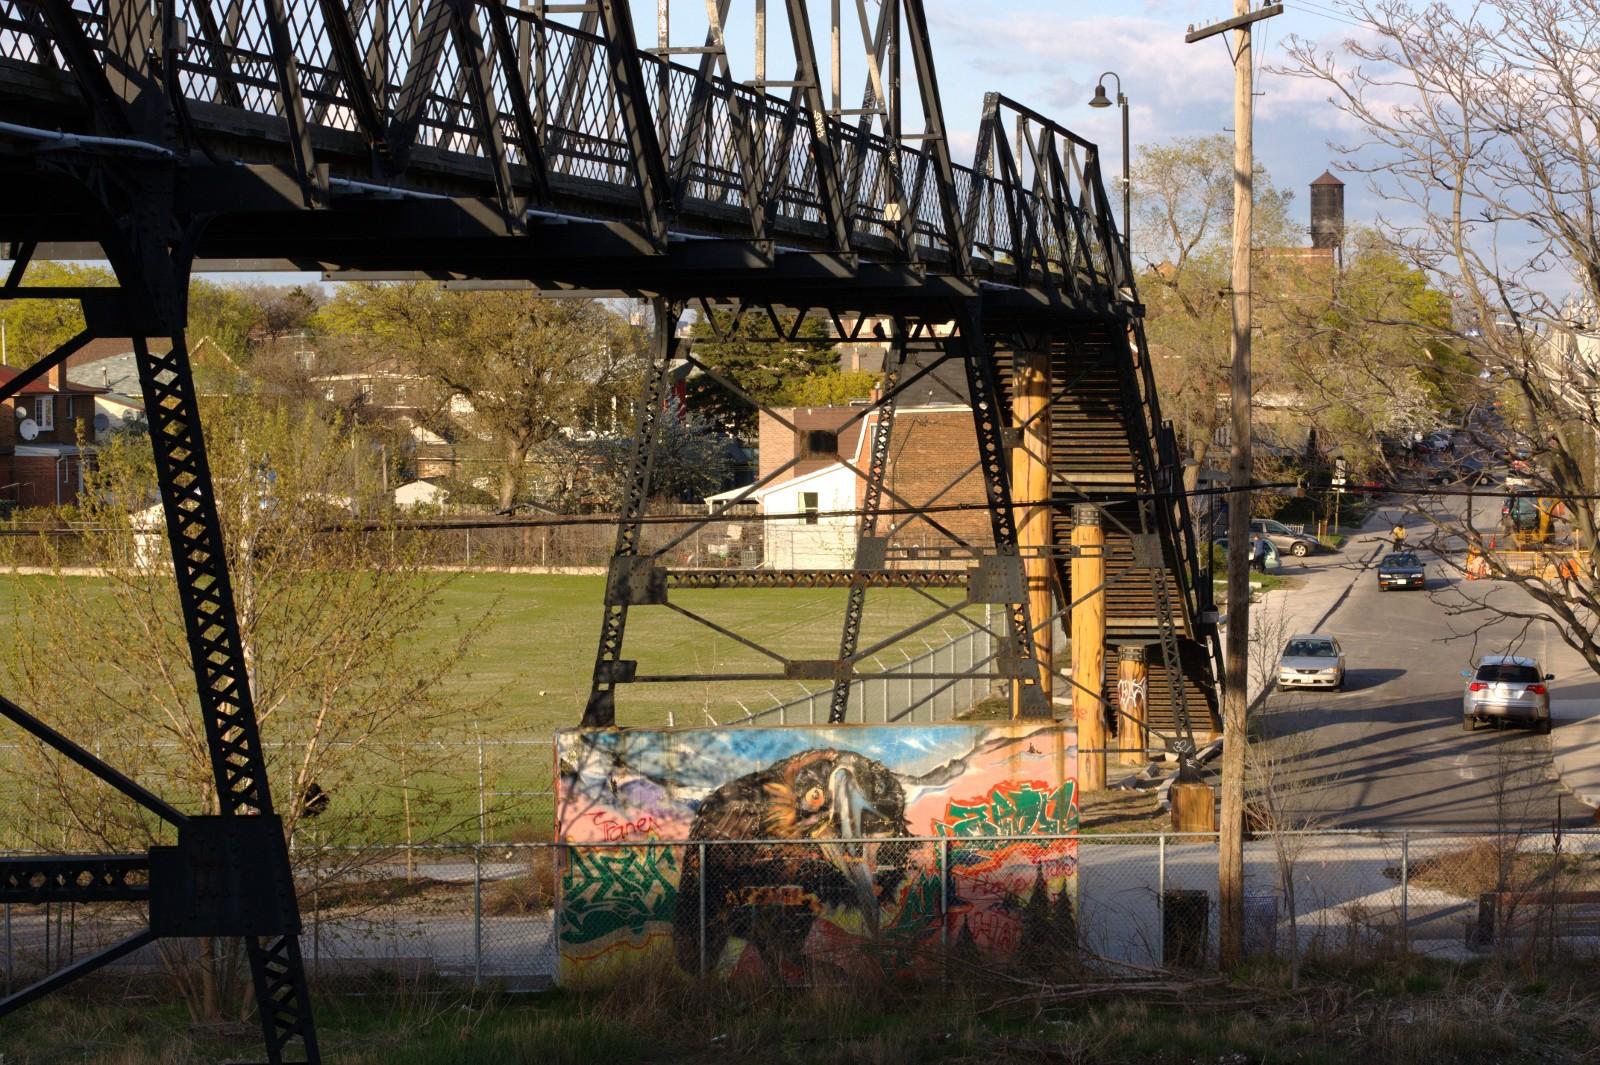 Wallace Ave. Bridge